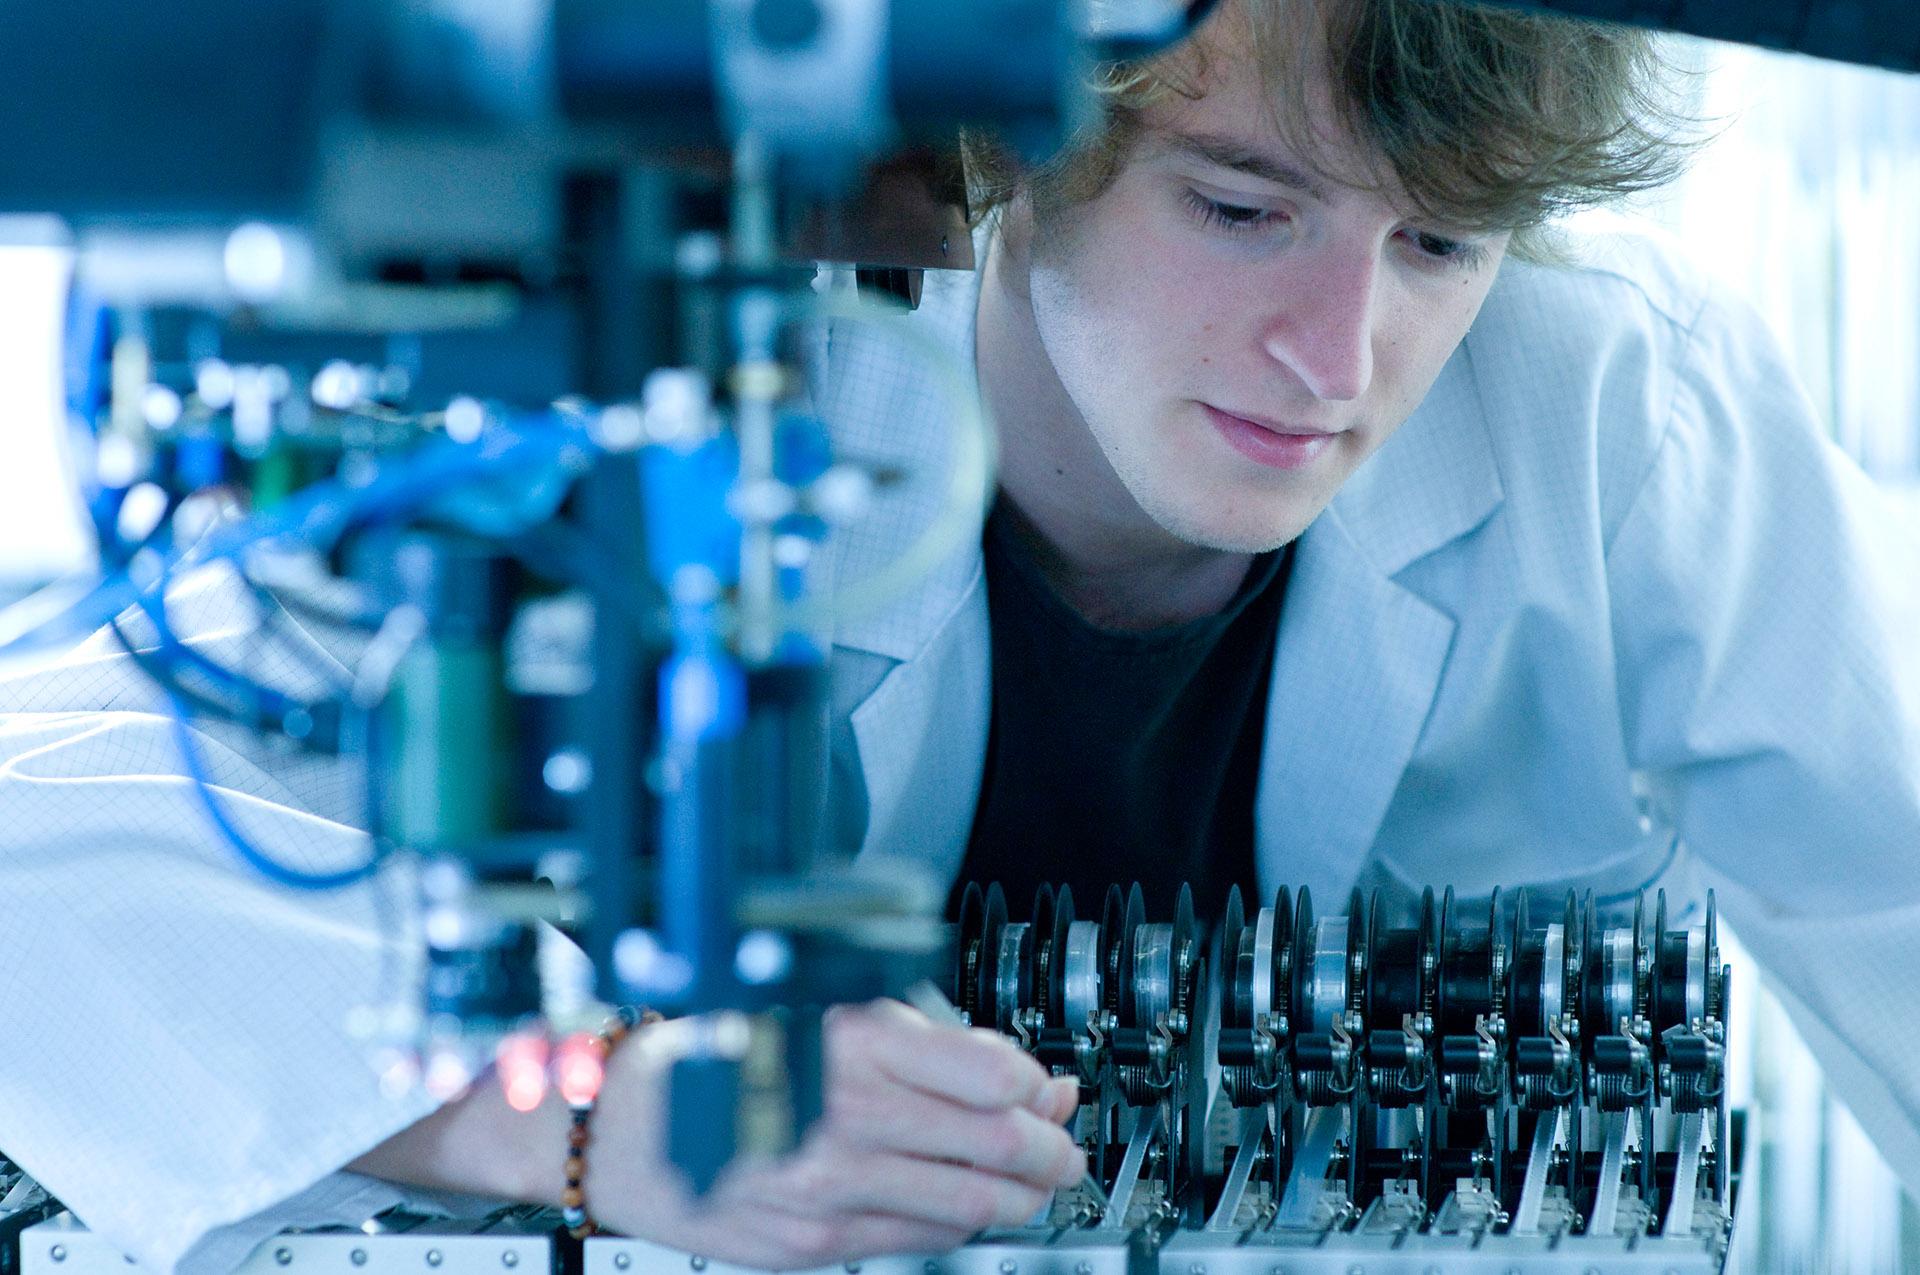 Mitarbeiter in Produktion leistet filigrane Arbeit an Maschinen. Feigfotodesign